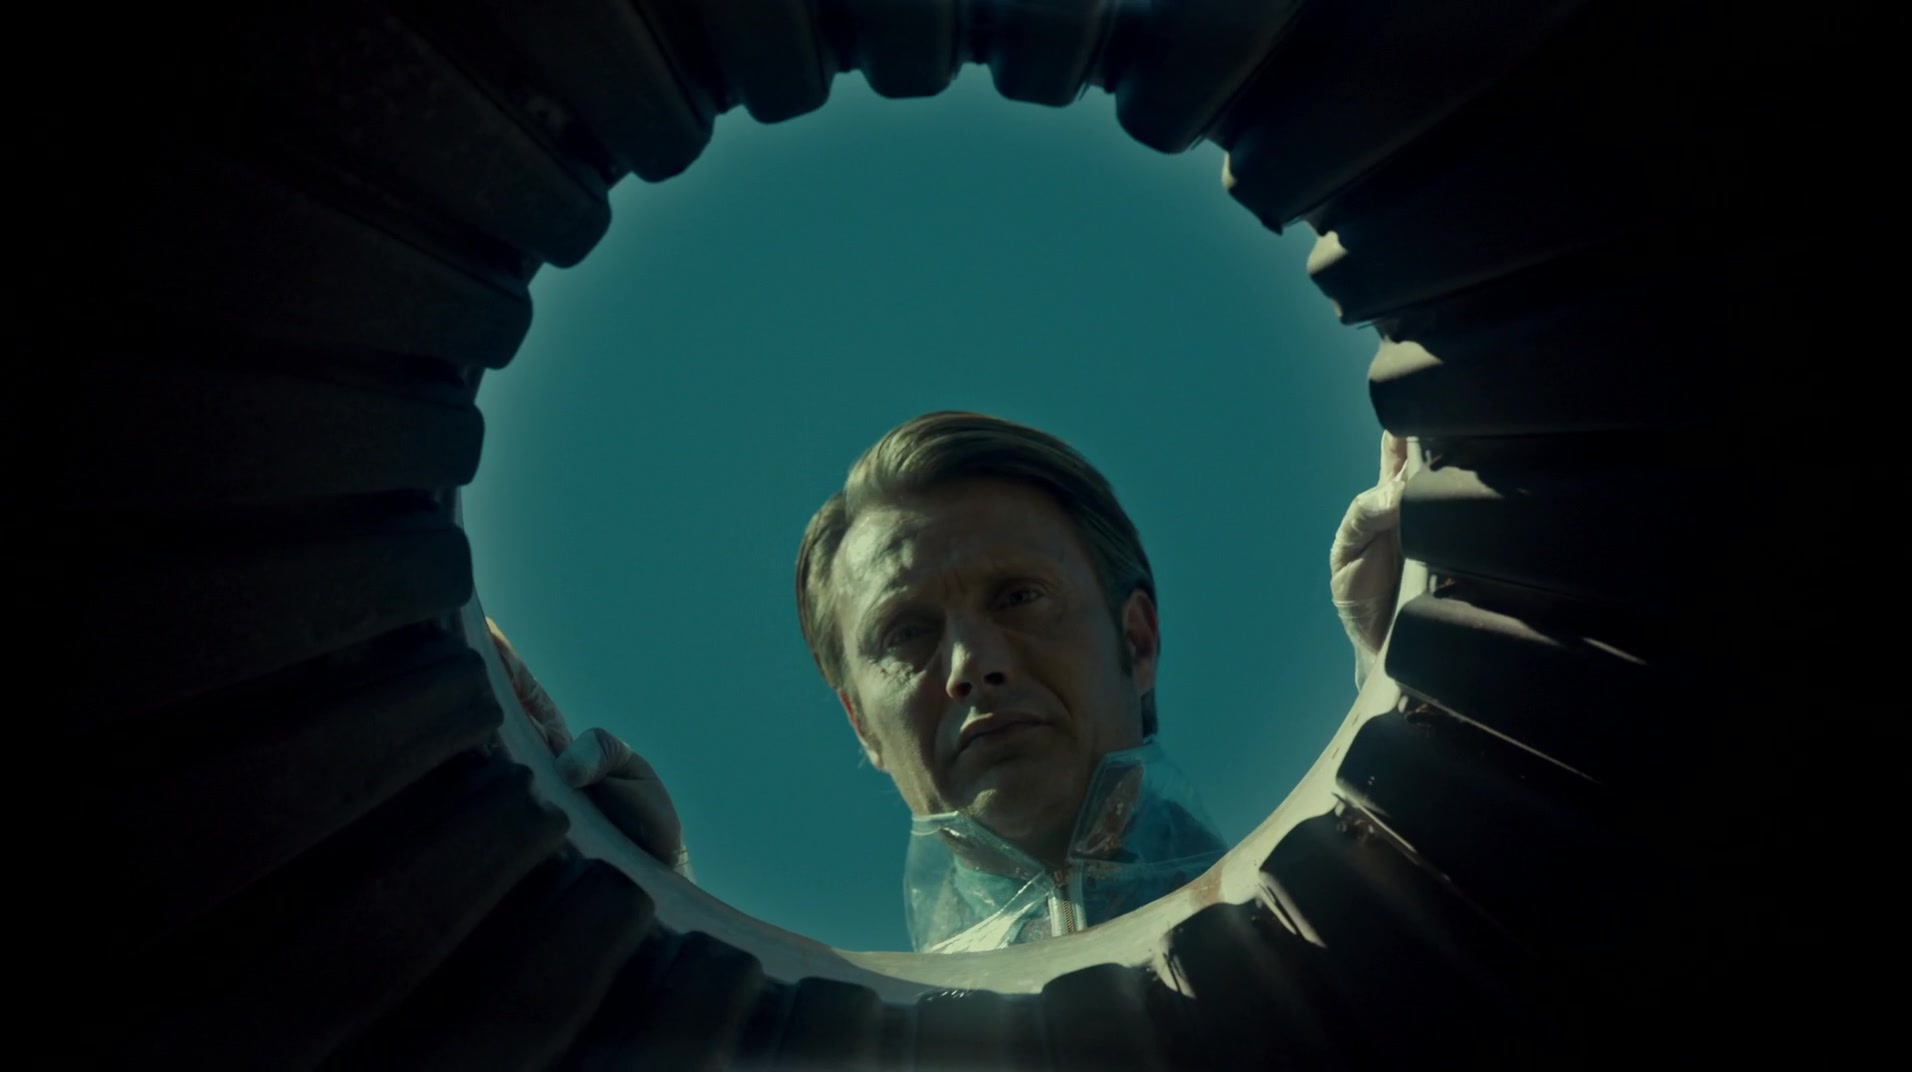 Hannibal سریالی بود که مخاطبان هیچگاه مطمئن نبودند لحظاتی بعد باید منتظر چه سورپرایزی باشند.